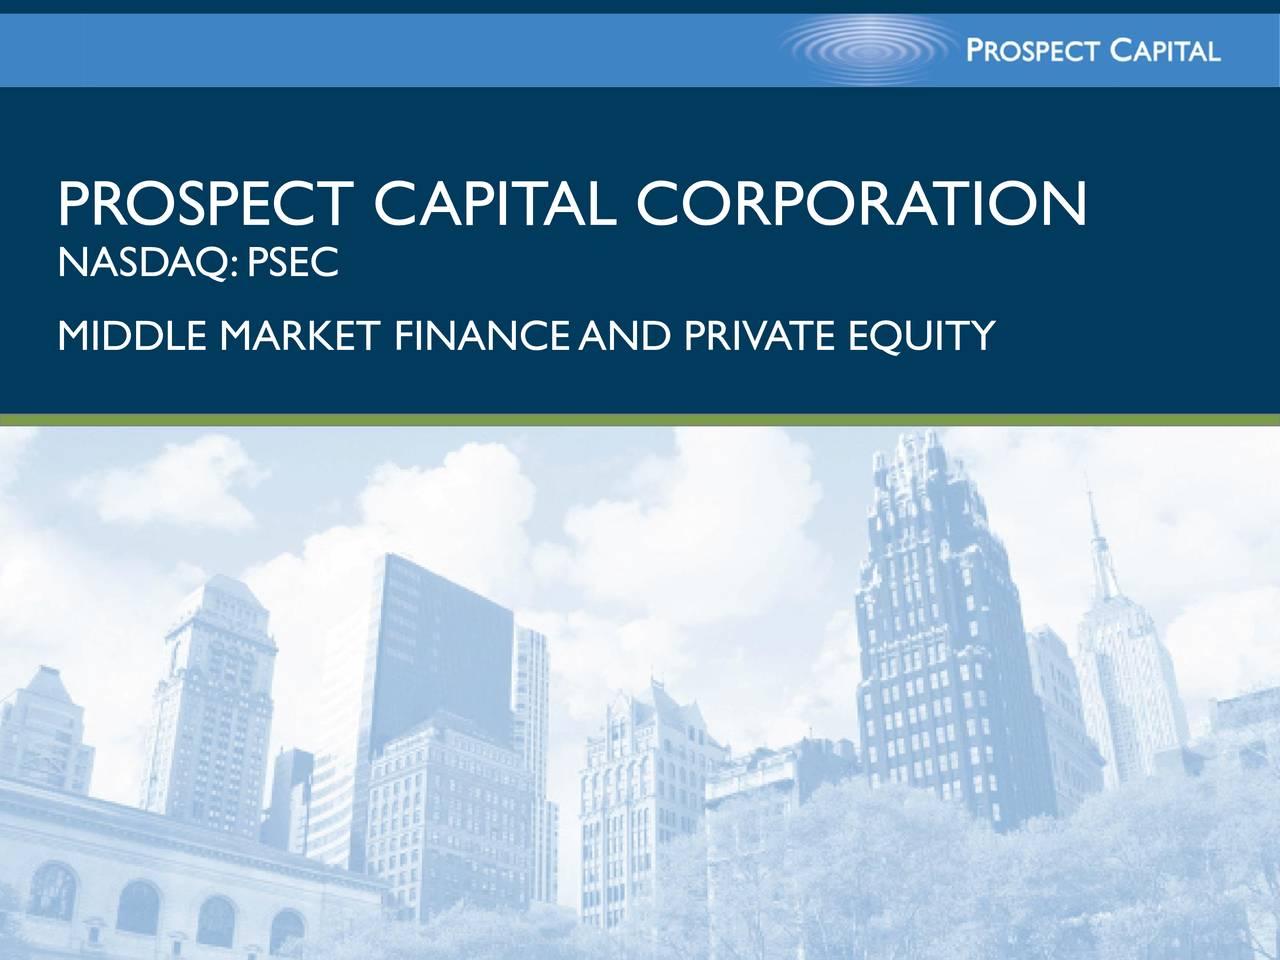 NASDAQ:PSEC MIDDLE MARKET FINANCEAND PRIVATE EQUITY 0